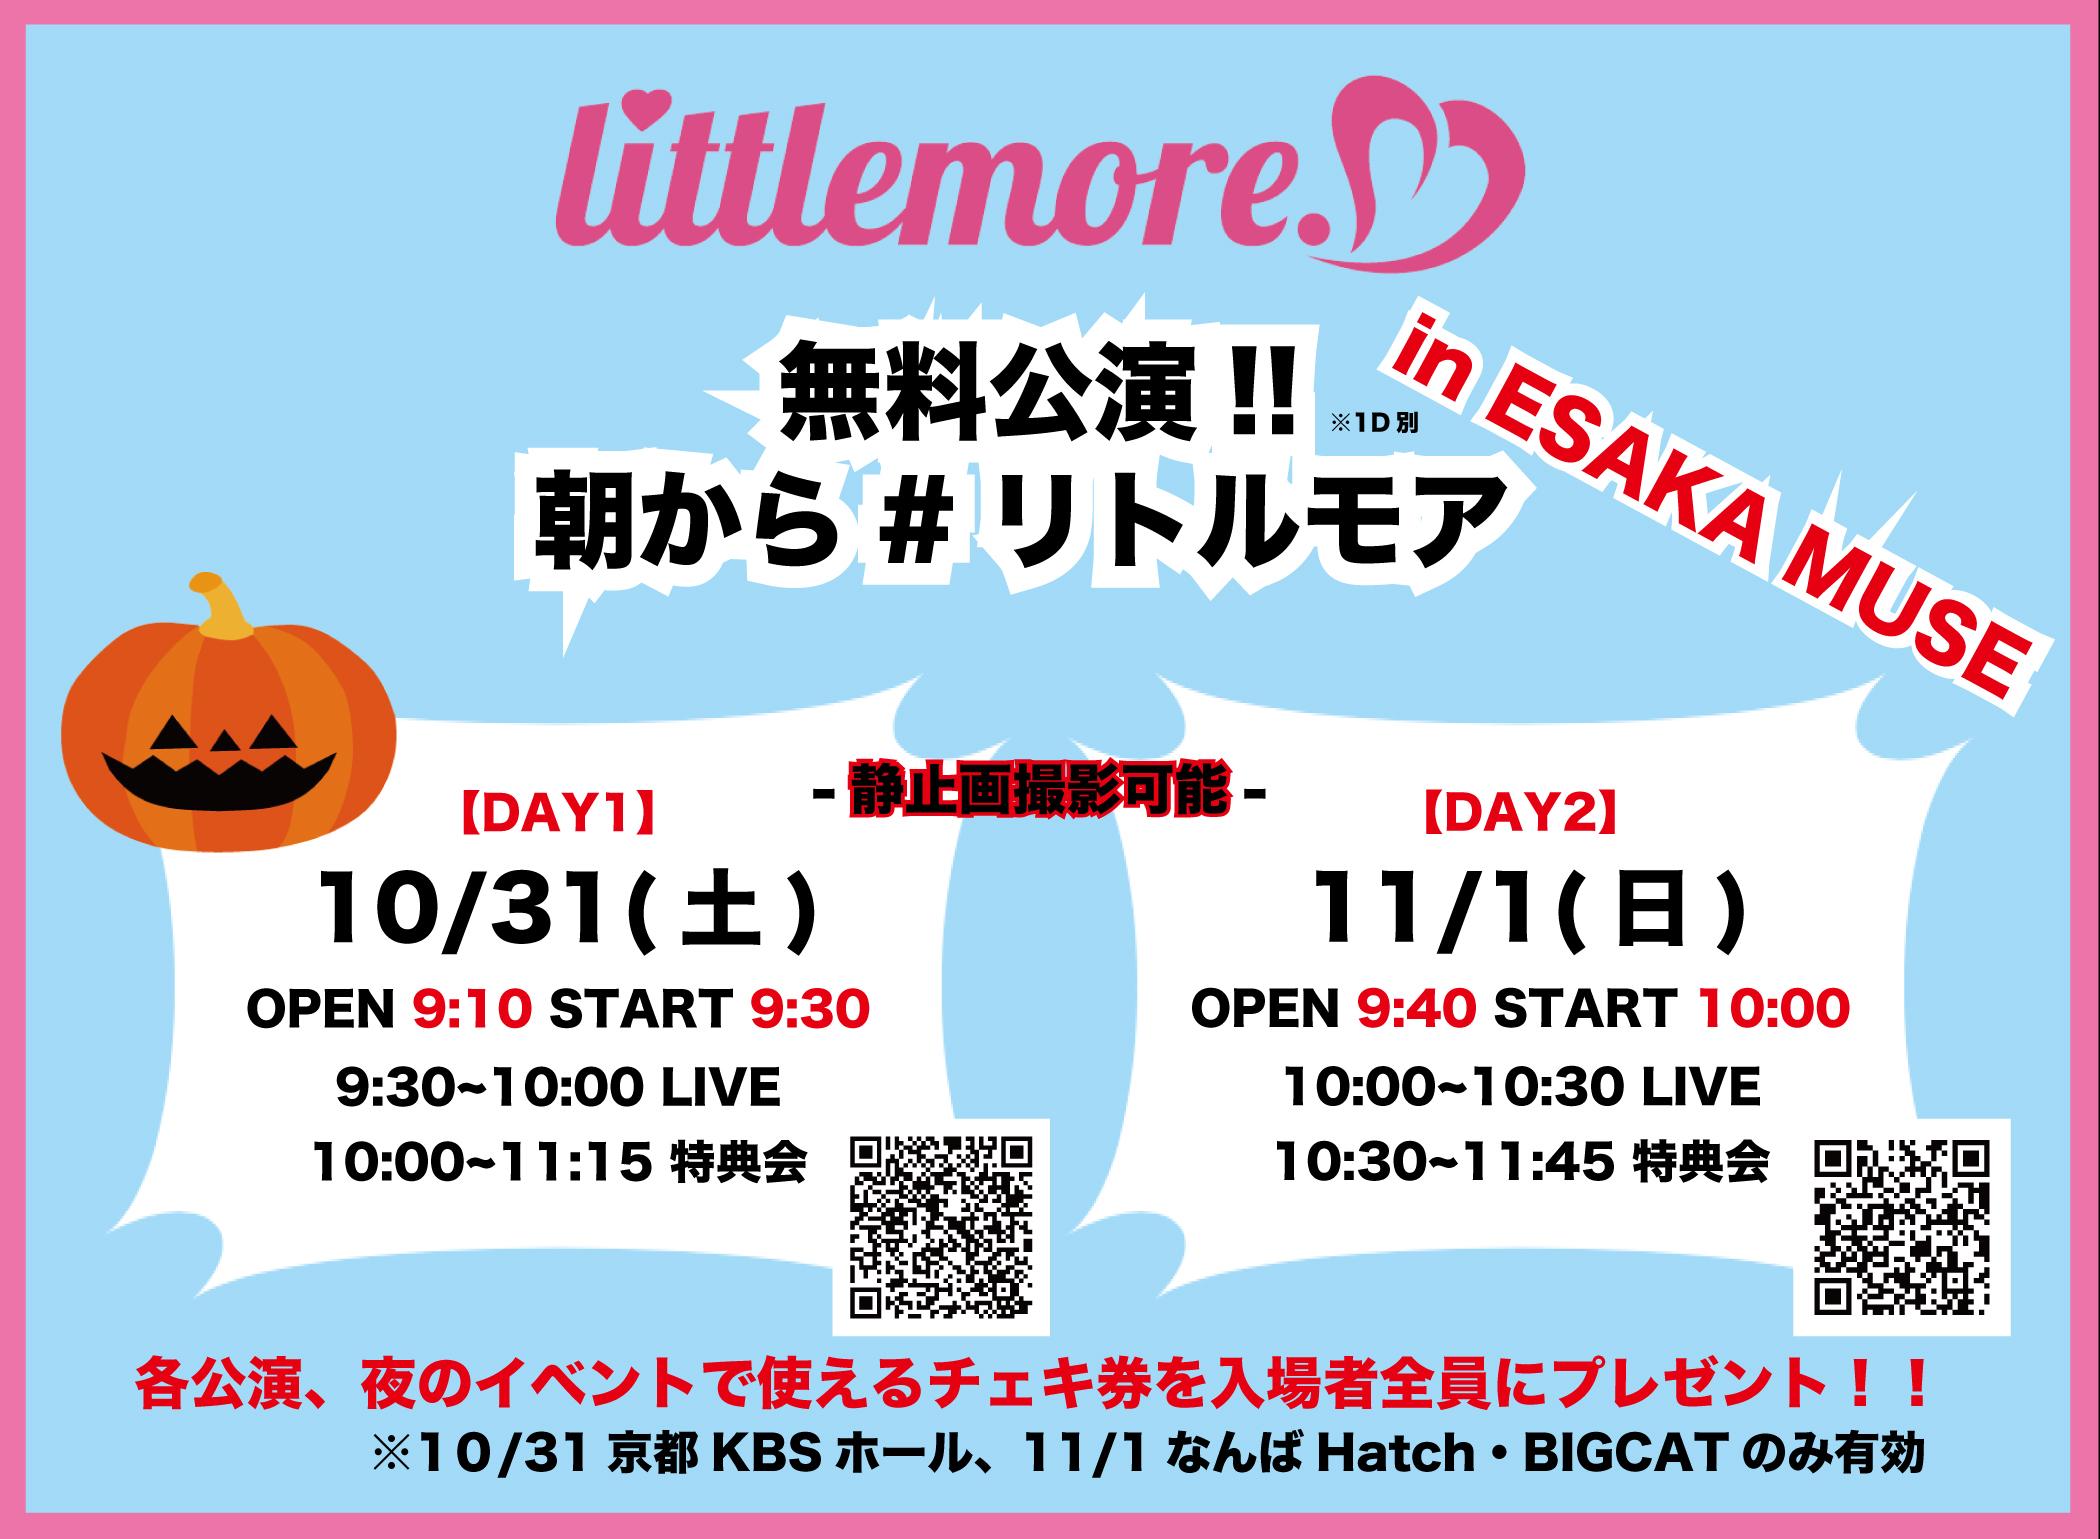 "littlemore. 無料公演 ~朝から #リトルモア 大阪編 ""day2""~"